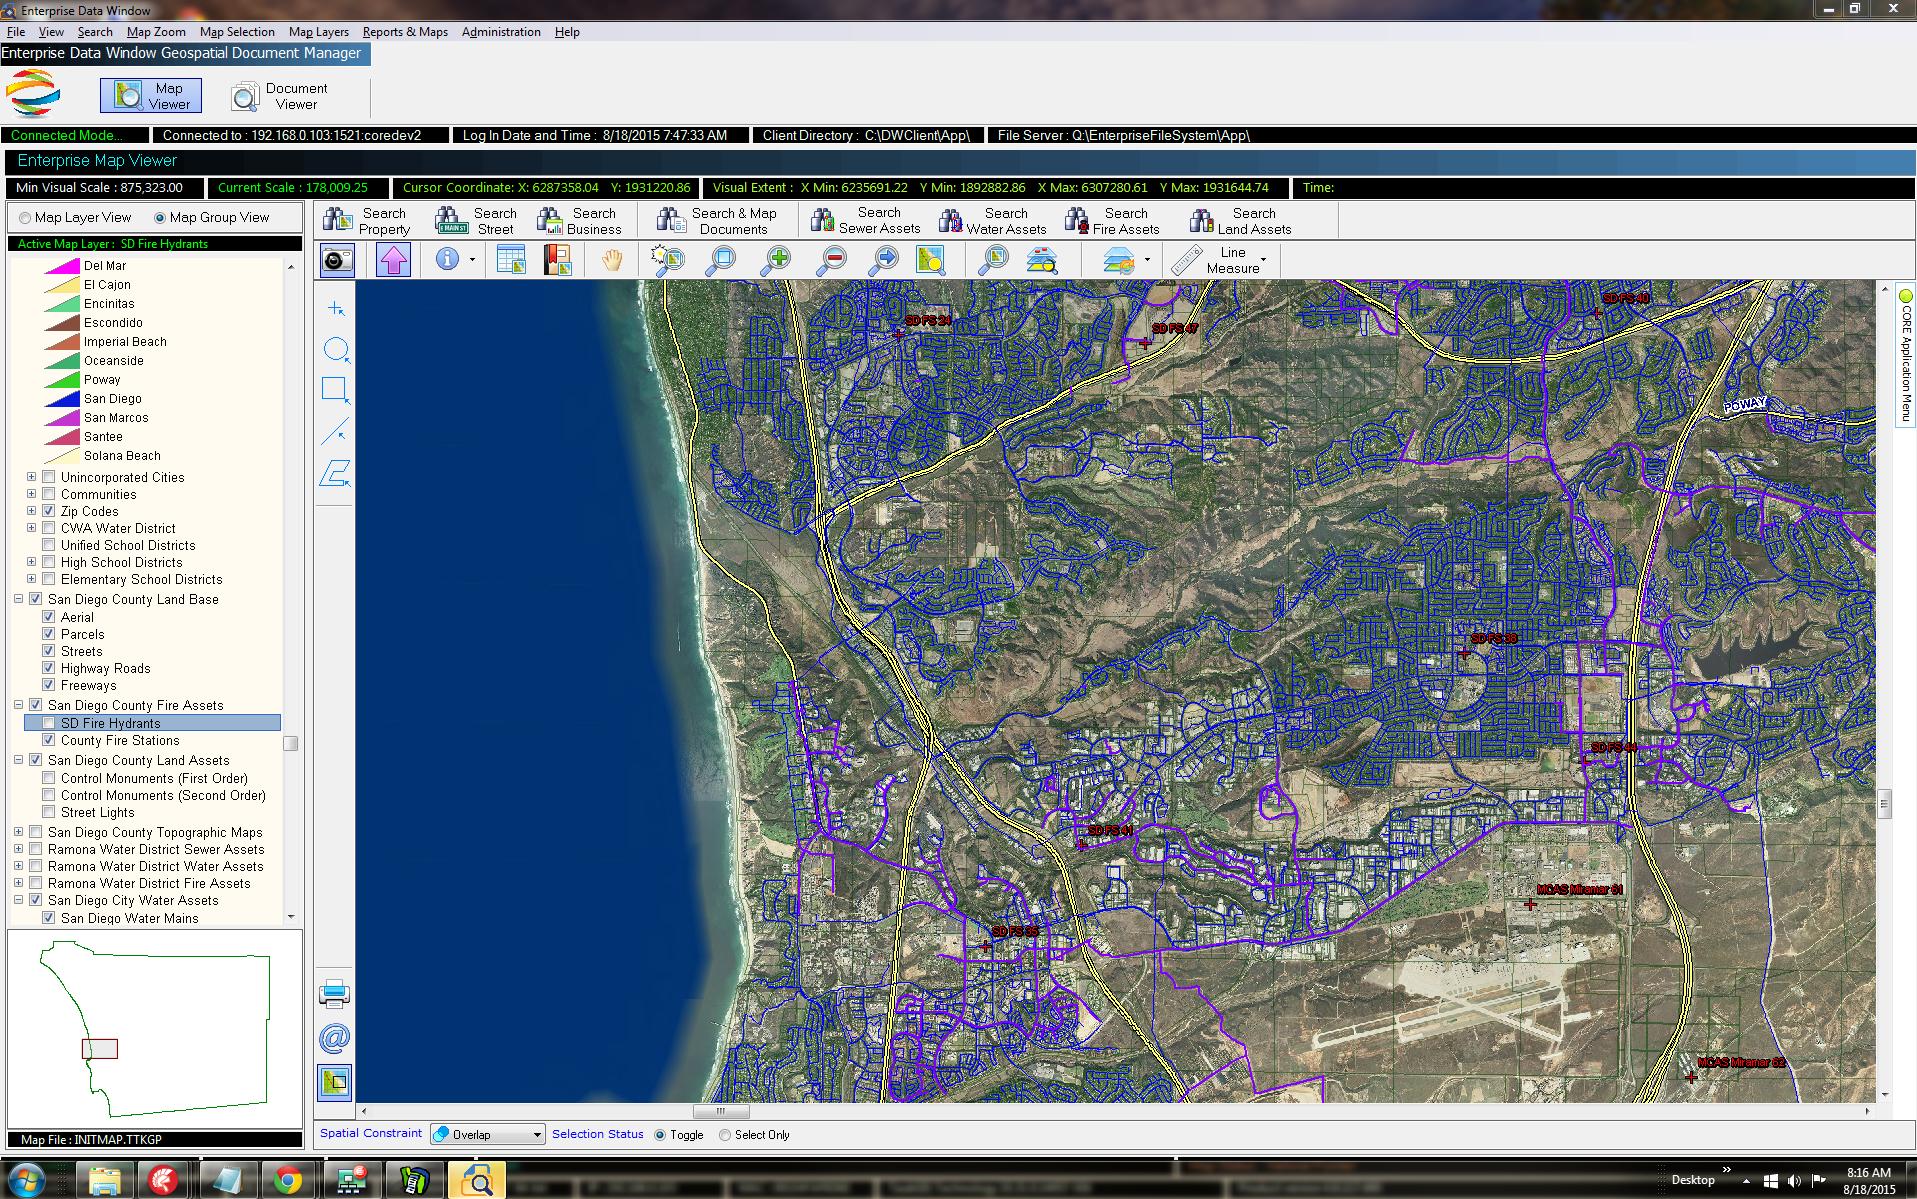 DWDM_MapWaterAssetspng.png